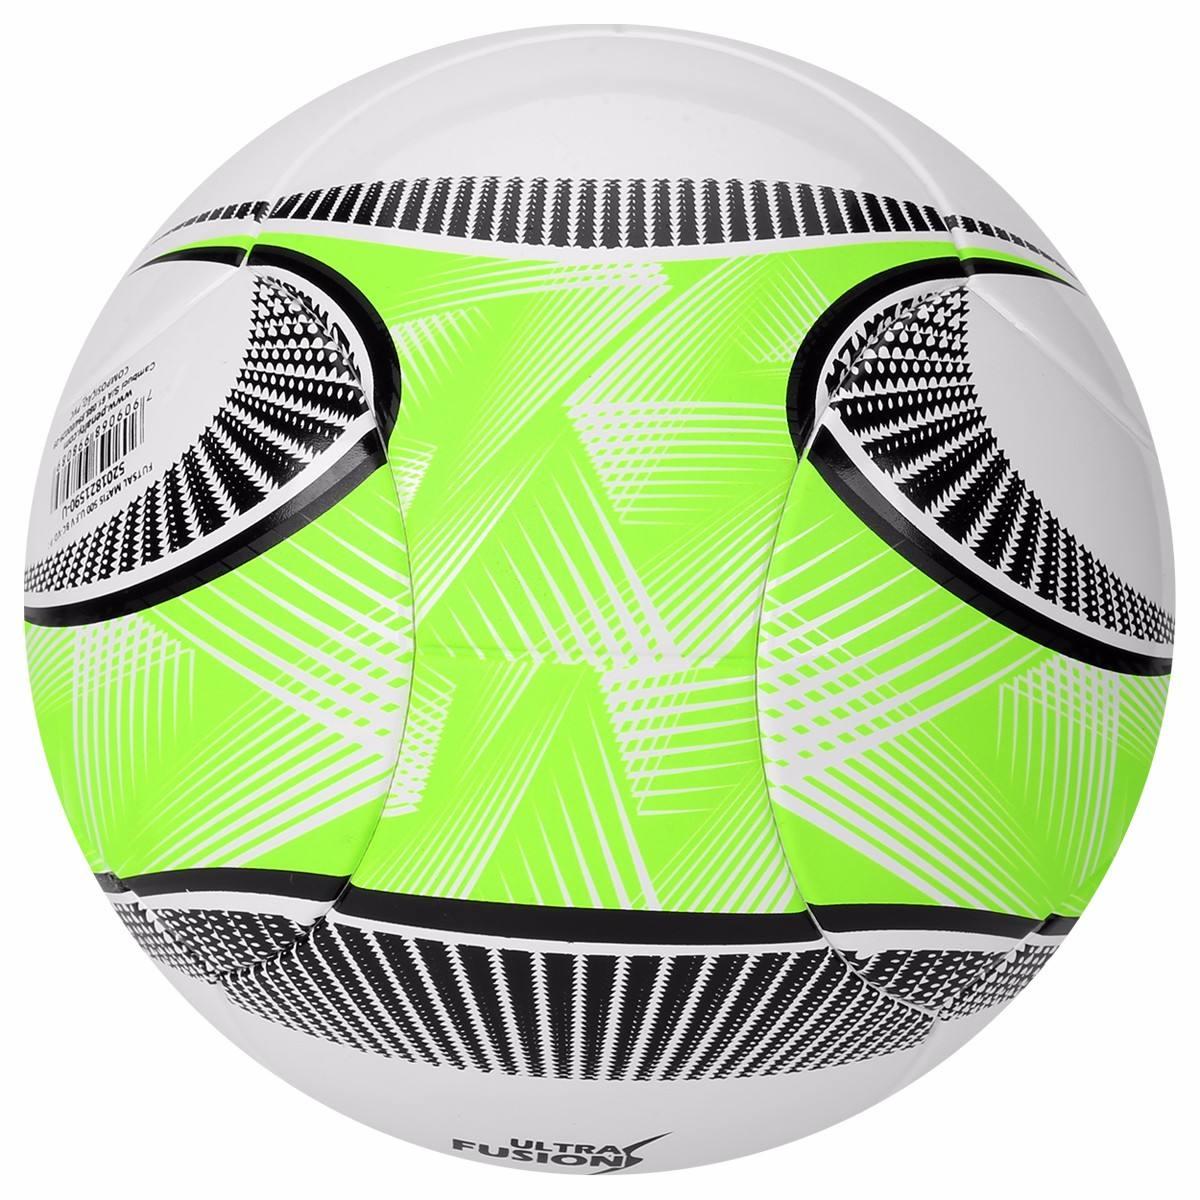 Bola Penalty Futsal Matis 500 Ultra Fusion 5 - Oficial - R  99 072bcb7bbd8fb